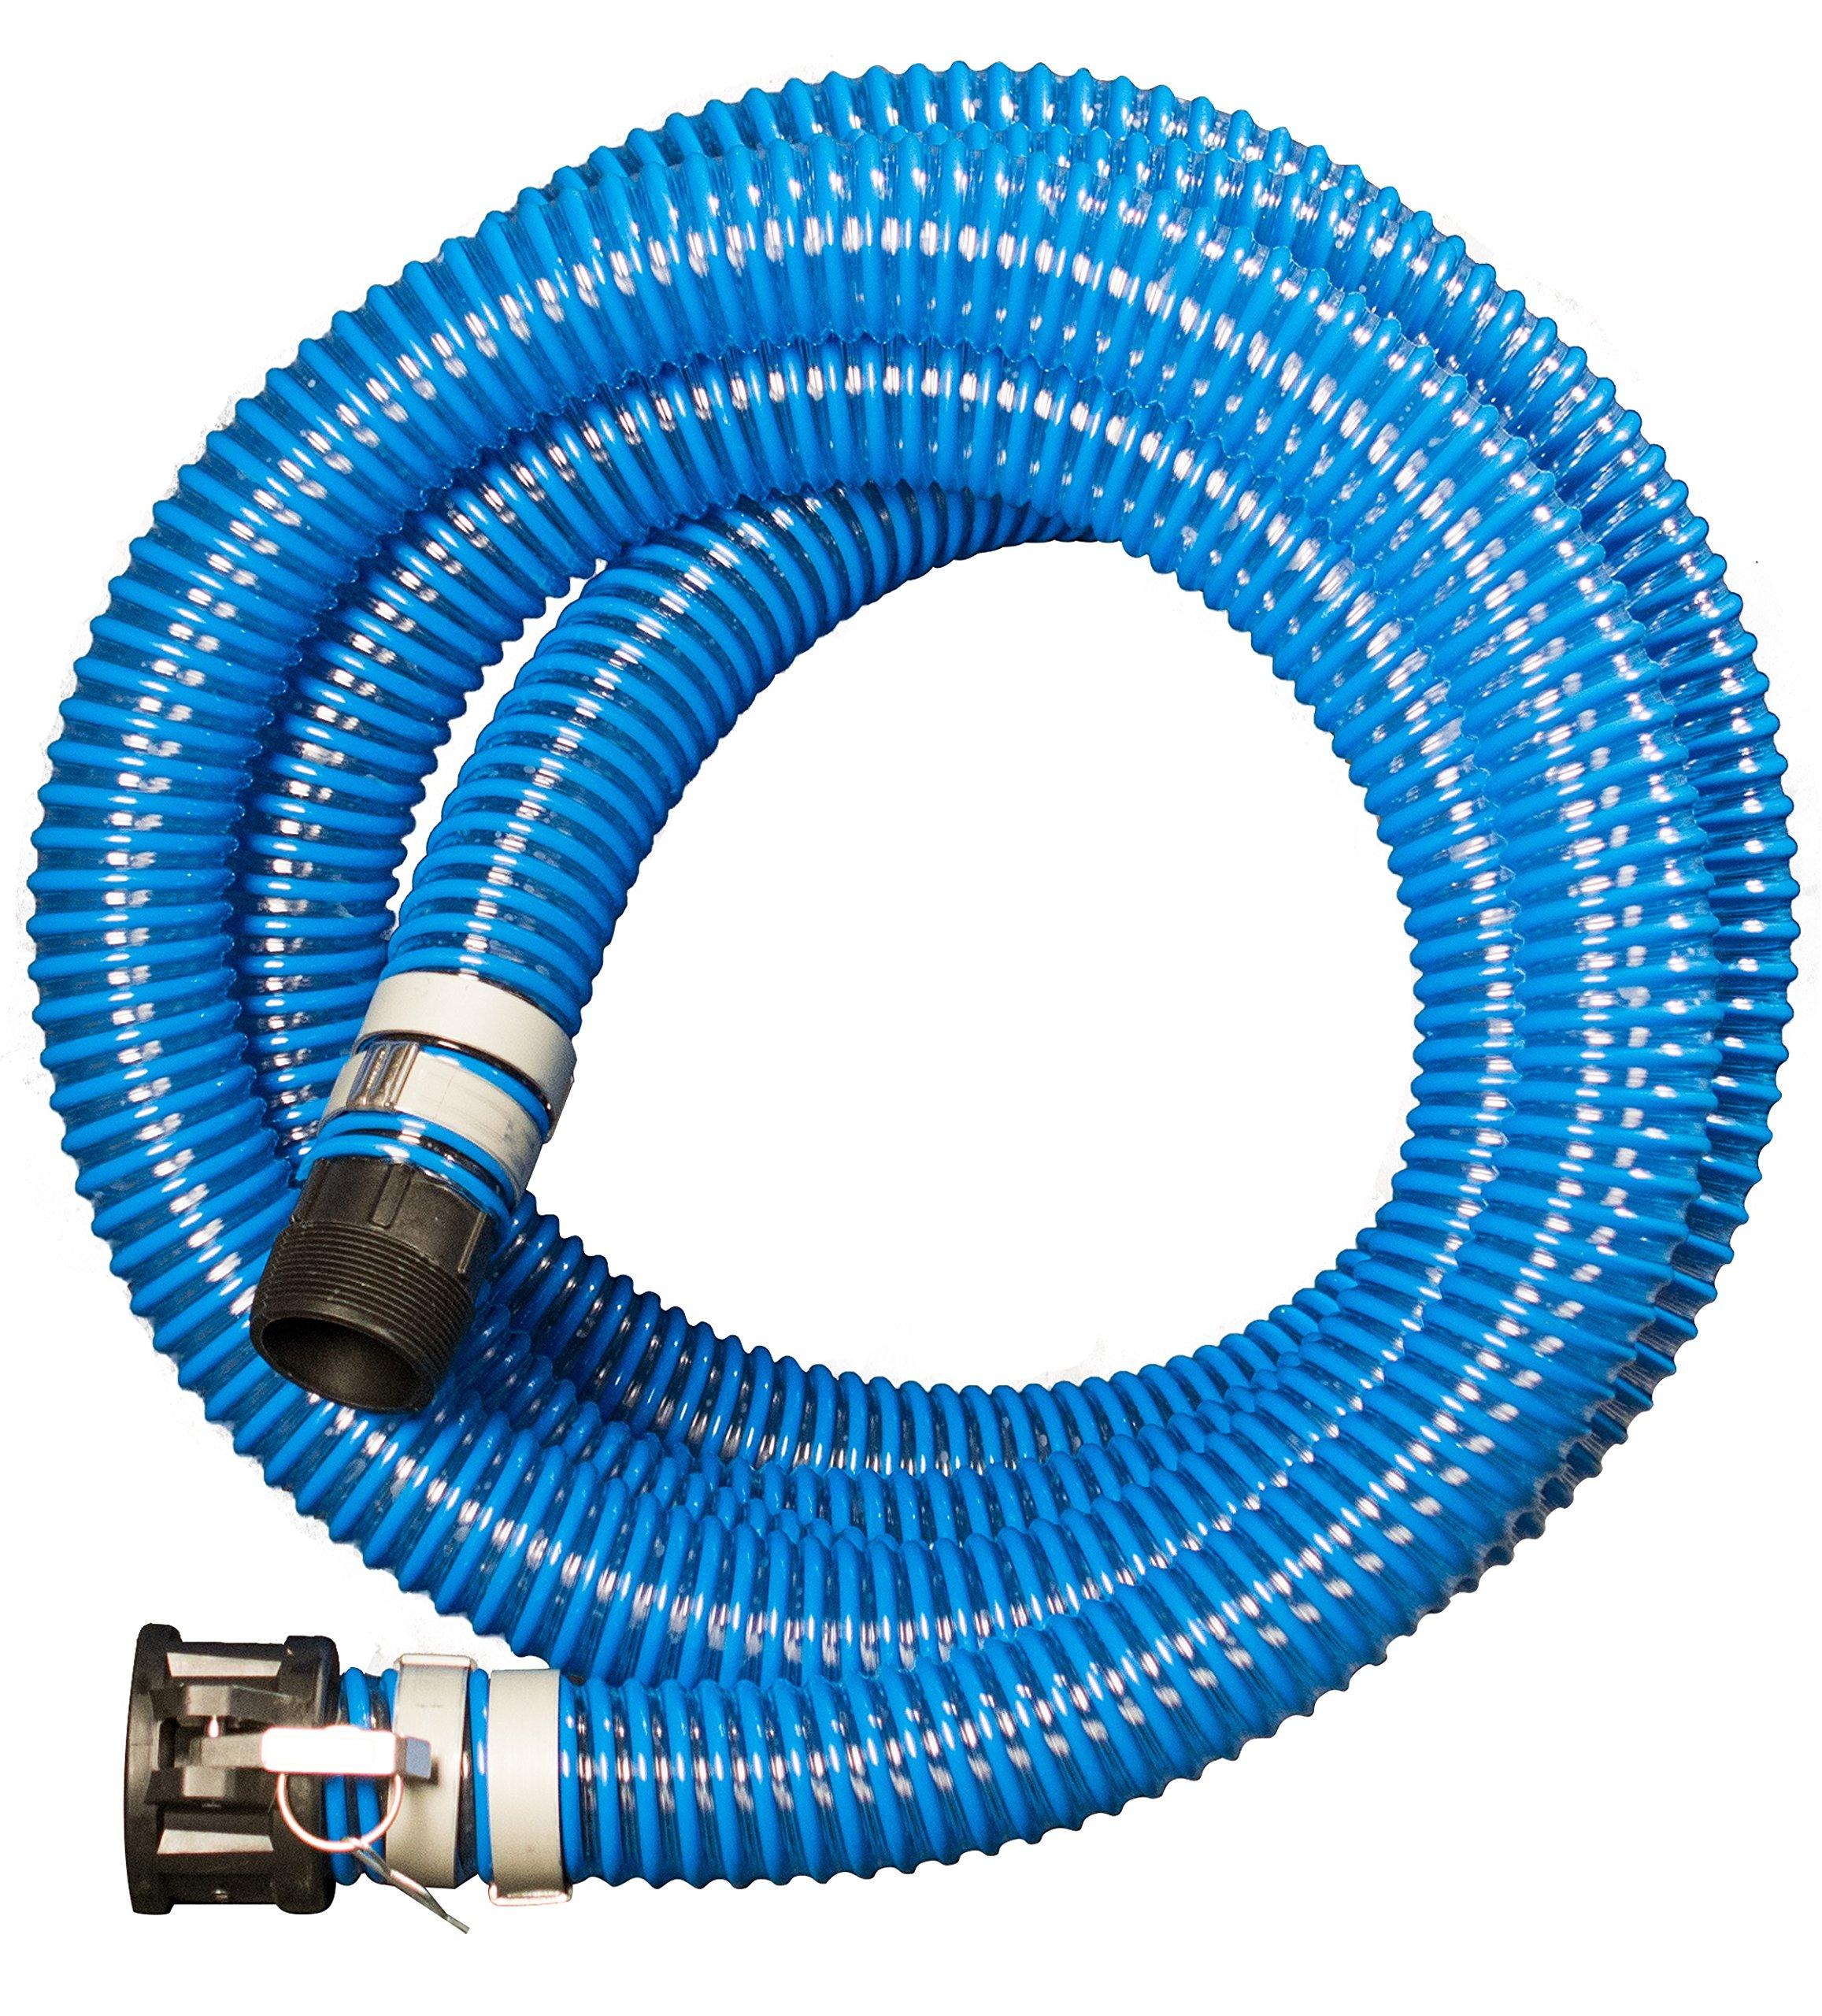 Apache 98106503 PVC Suction Poly CX King Nipple Hose, 40 psi, 2'' Inside Diameter, Blue